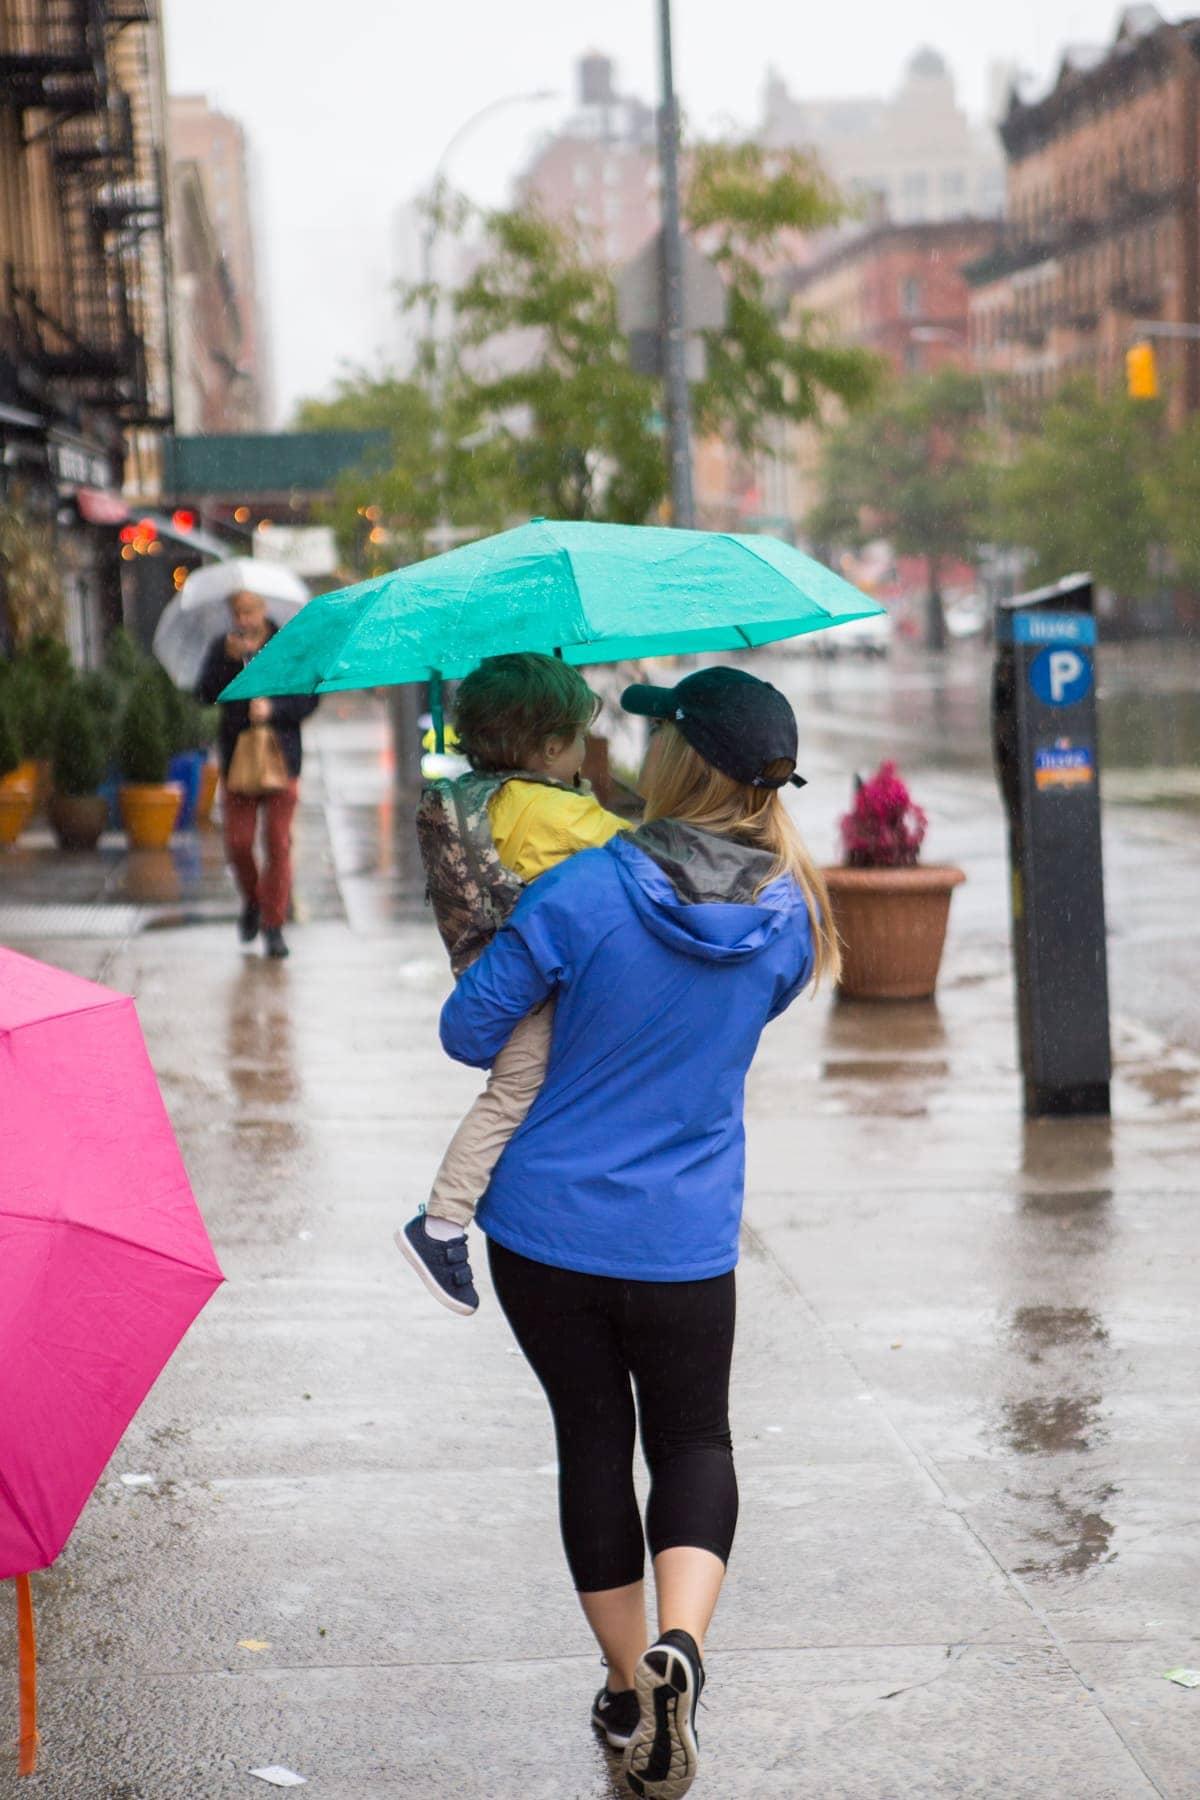 A woman walking down a street holding an umbrella